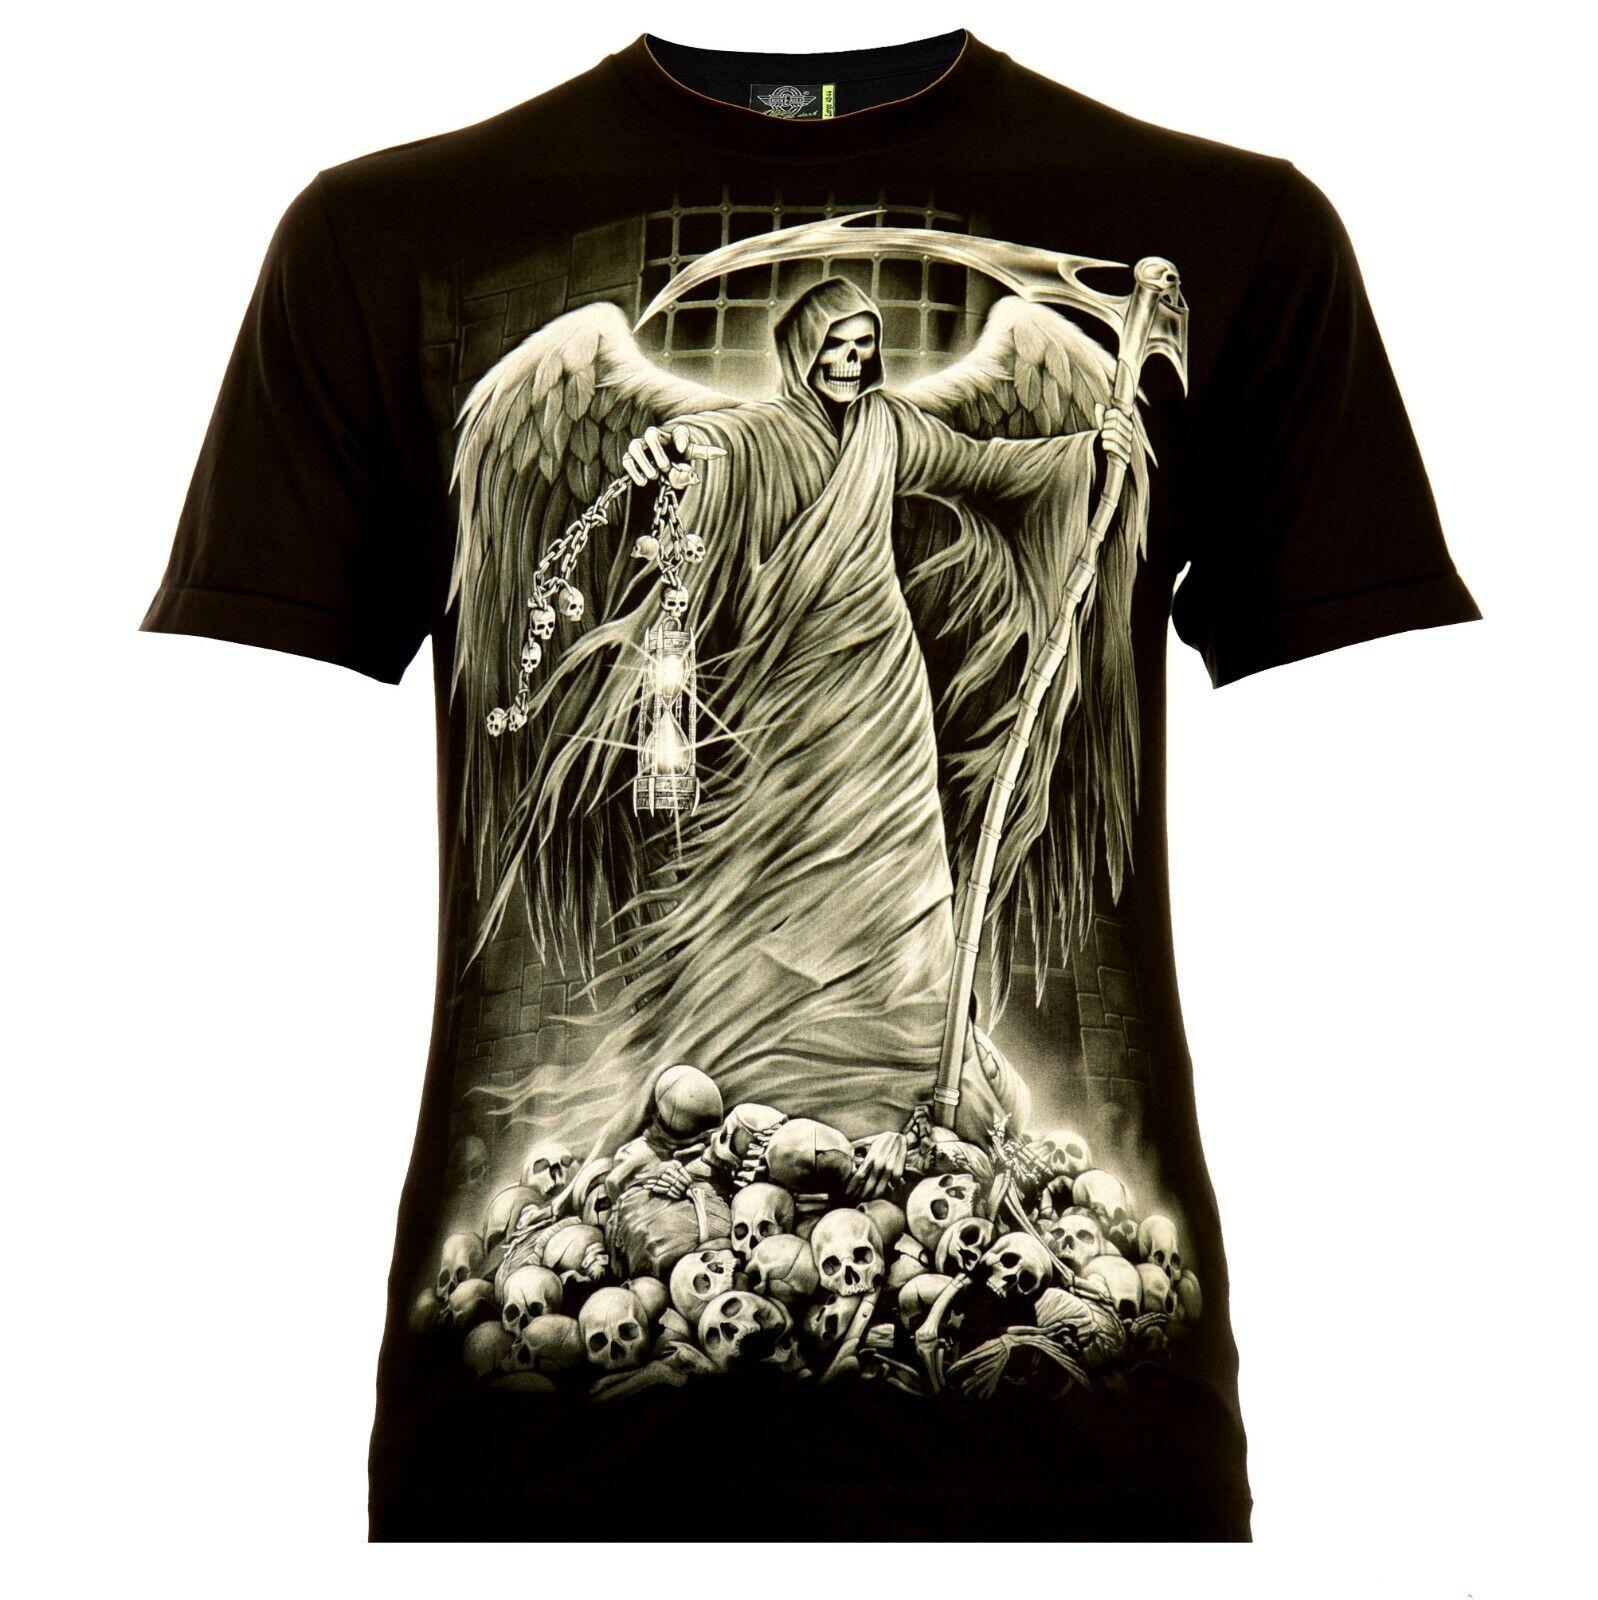 Rock Eagle Soul Reaper Herren T-Shirt Schwarz Skull Geist Ghost Totenkopf Glow